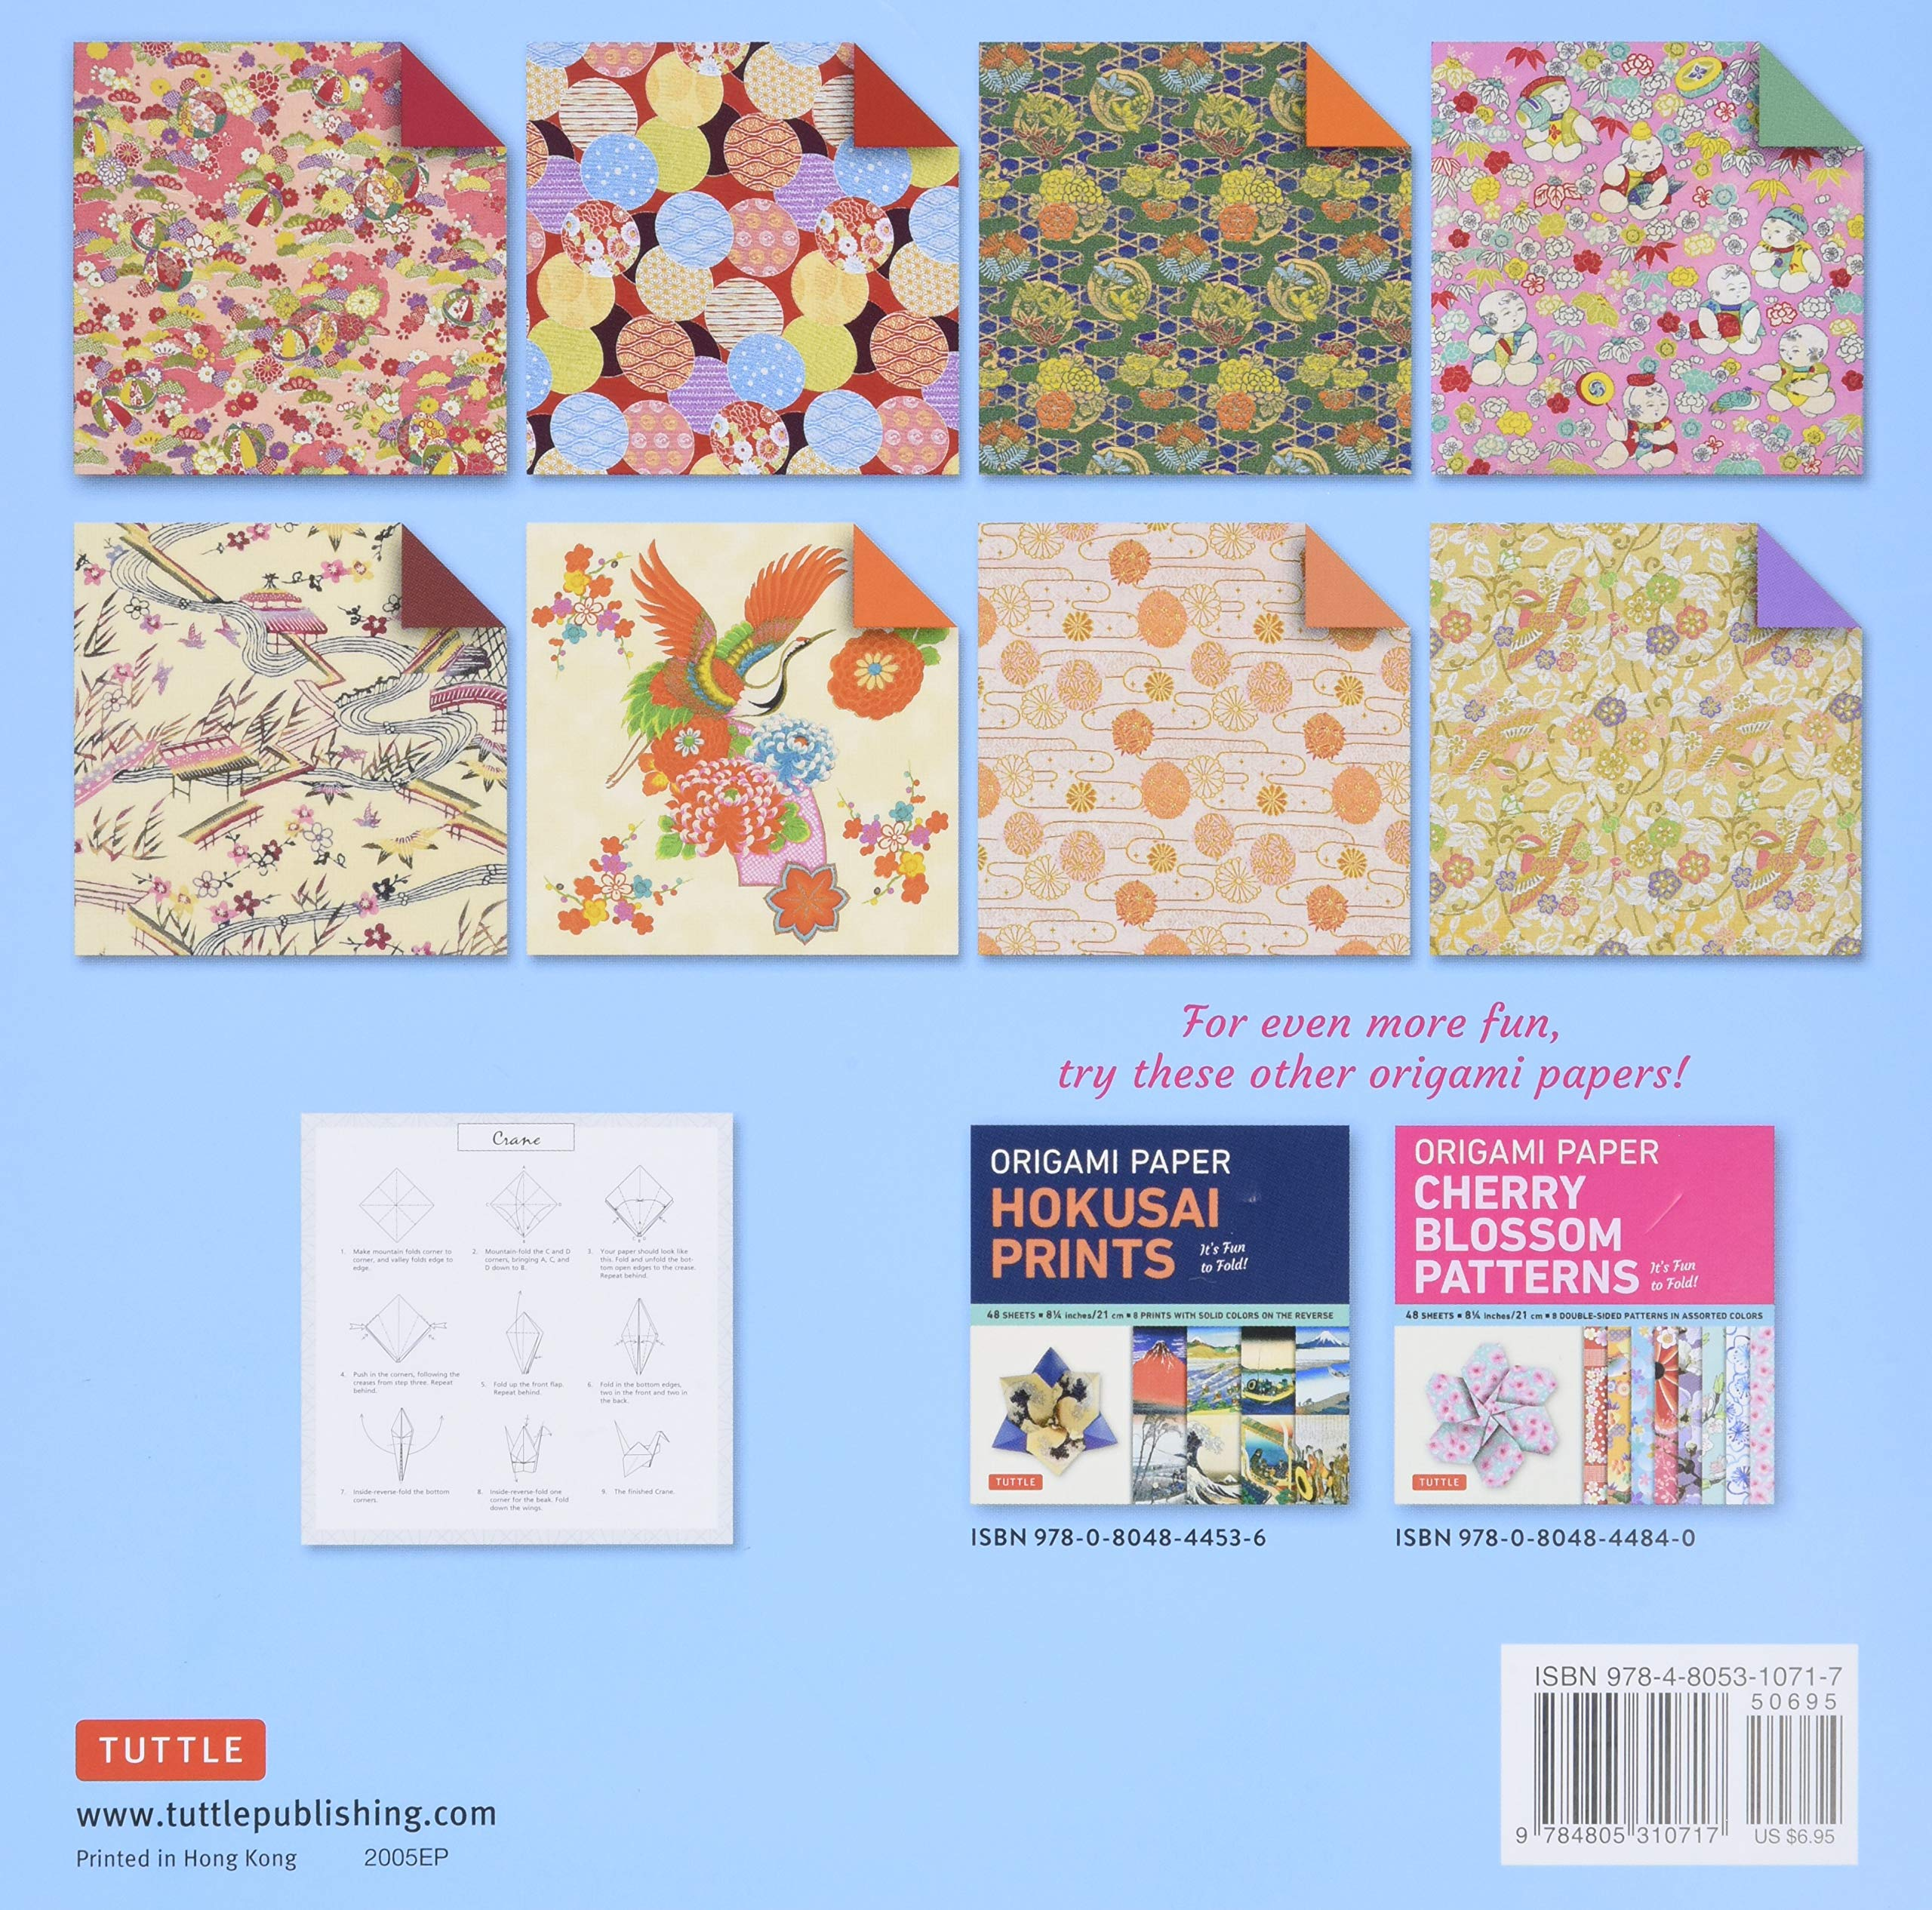 Origami Paper Kimono Patterns (Large 8 1/4